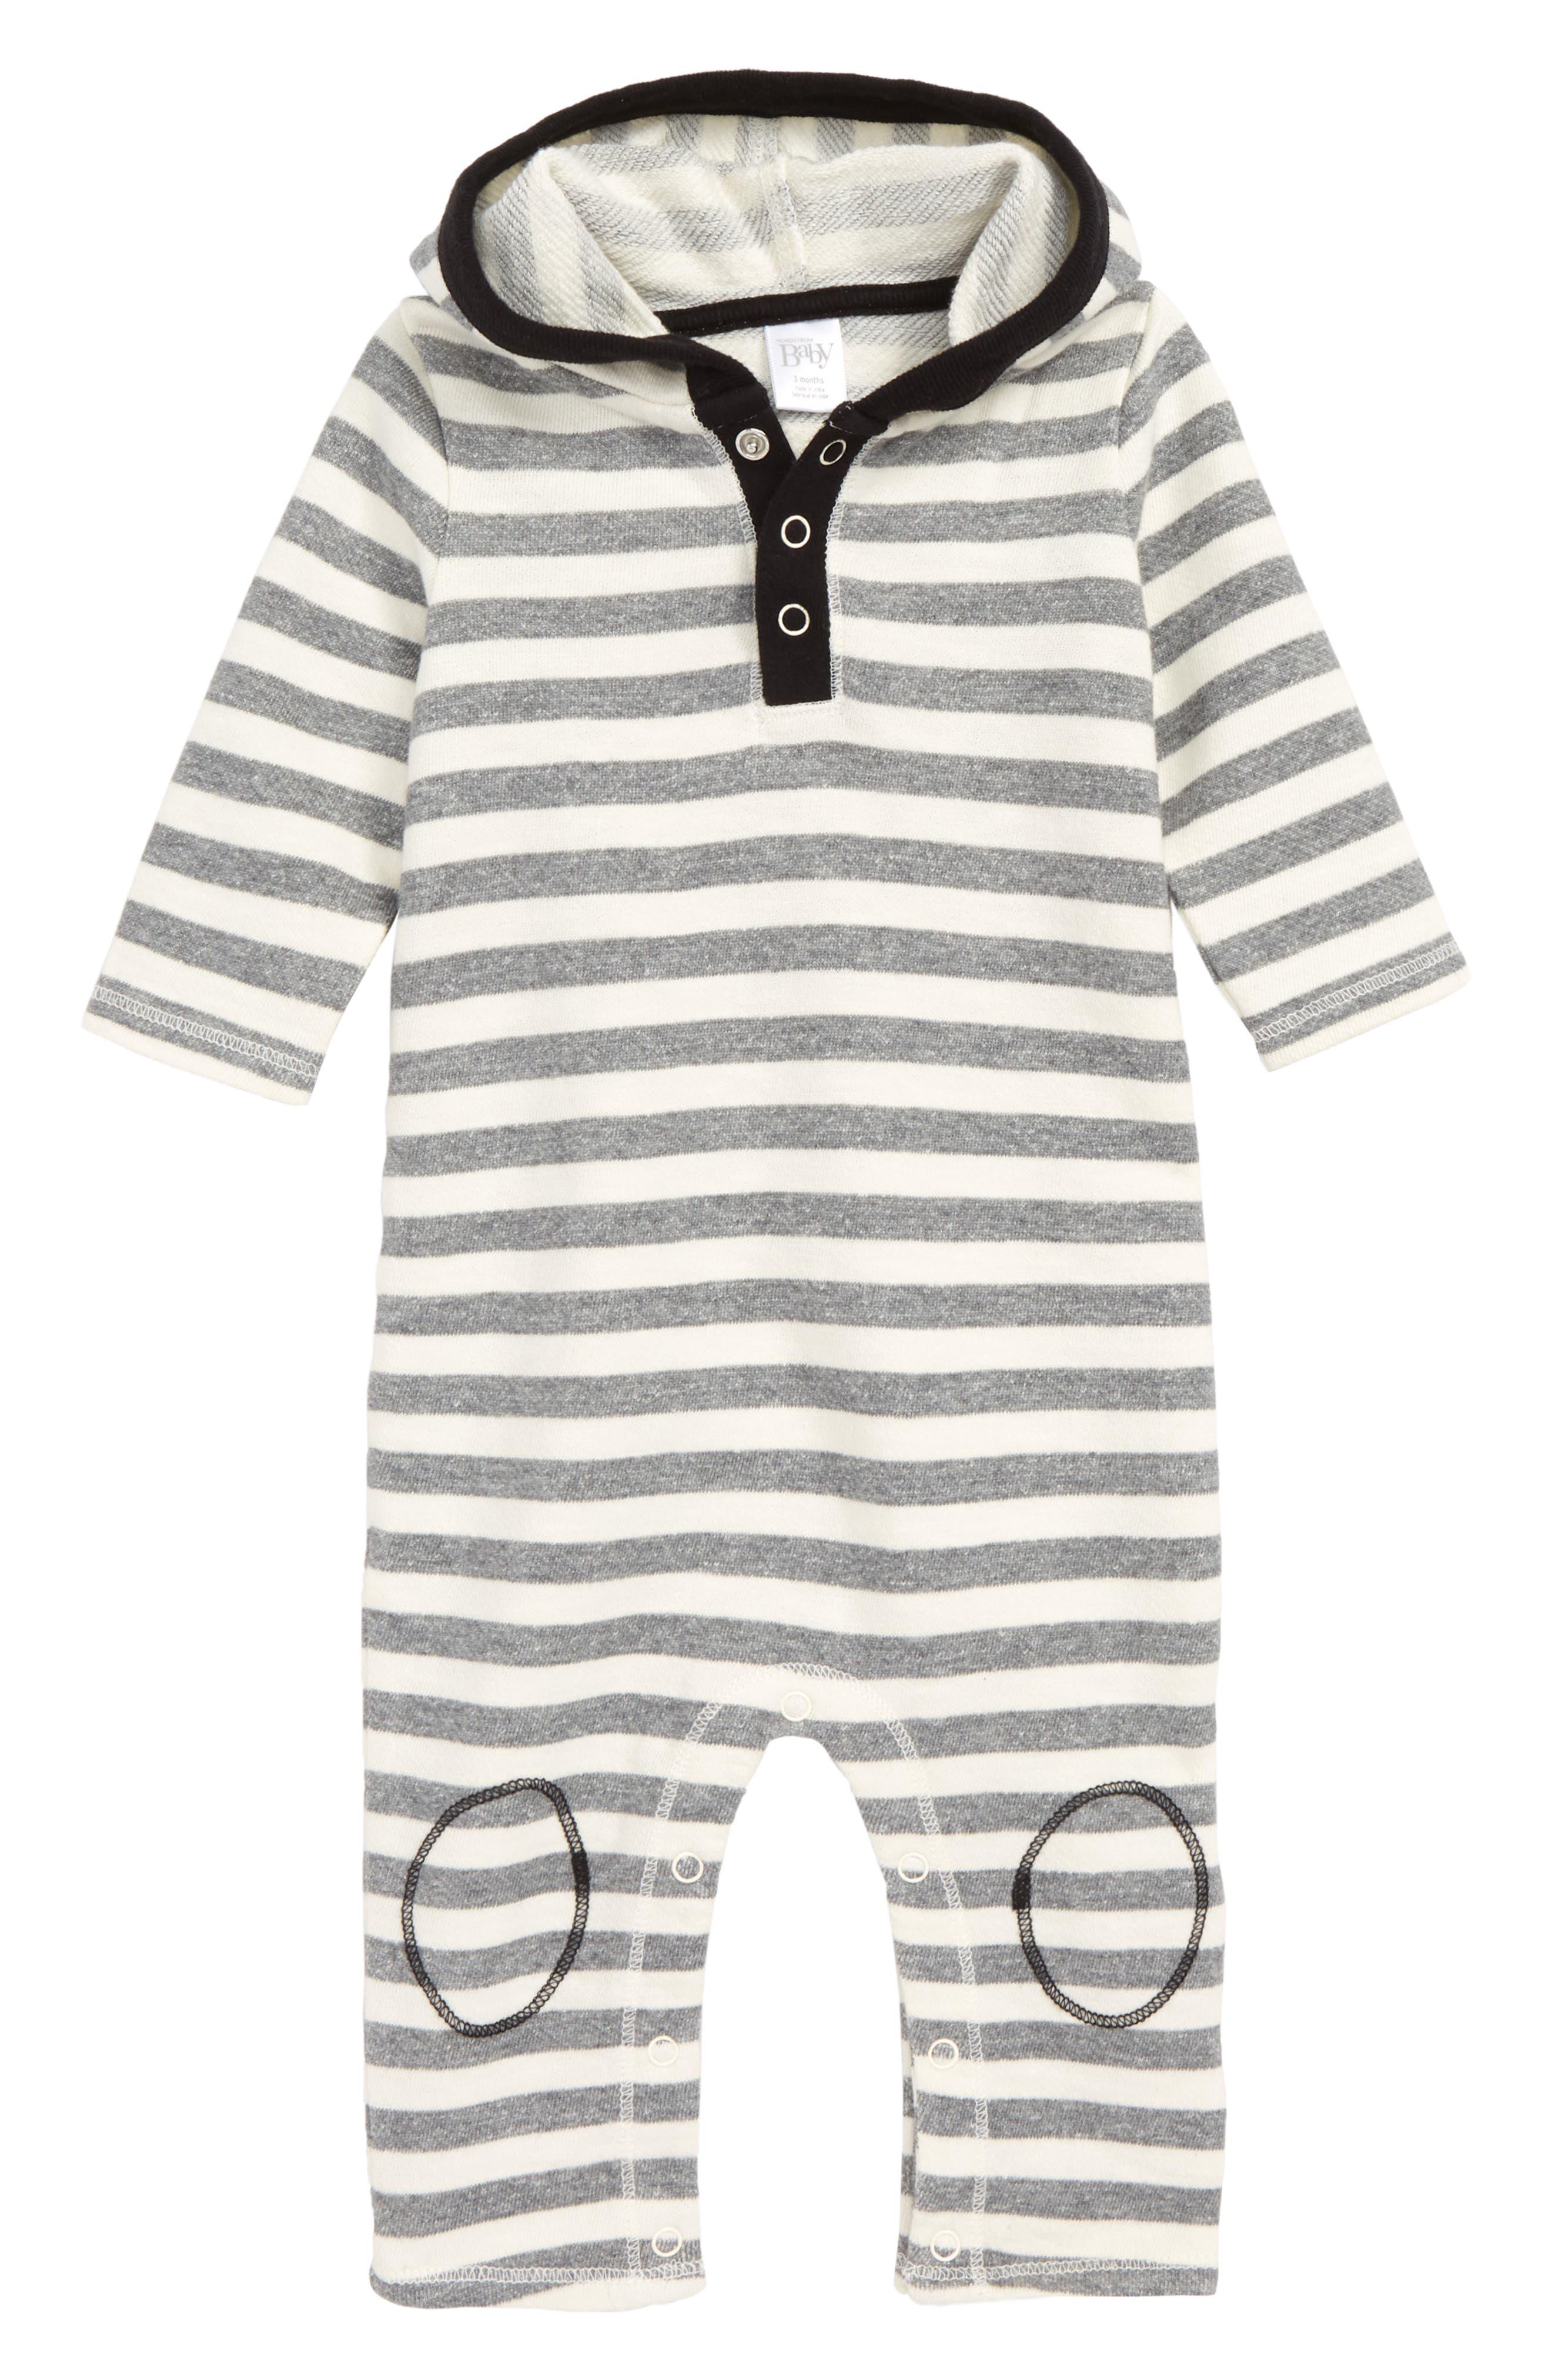 NORDSTROM BABY, Stripe Hooded Romper, Main thumbnail 1, color, IVORY EGRET- GREY STRIPE